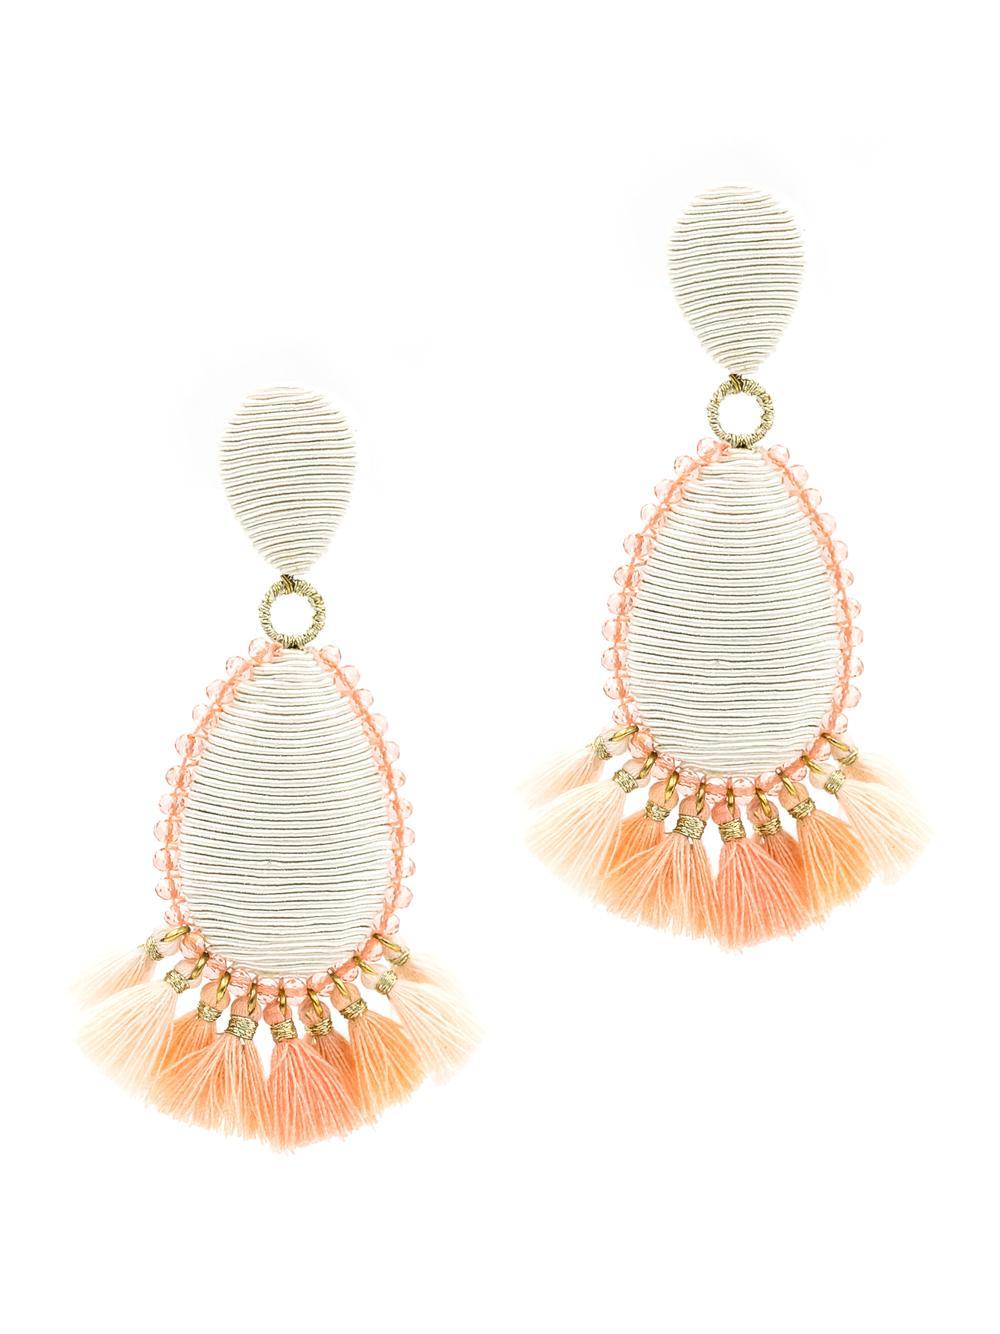 Exuma Tassel Earrings Item # 354LDEIB